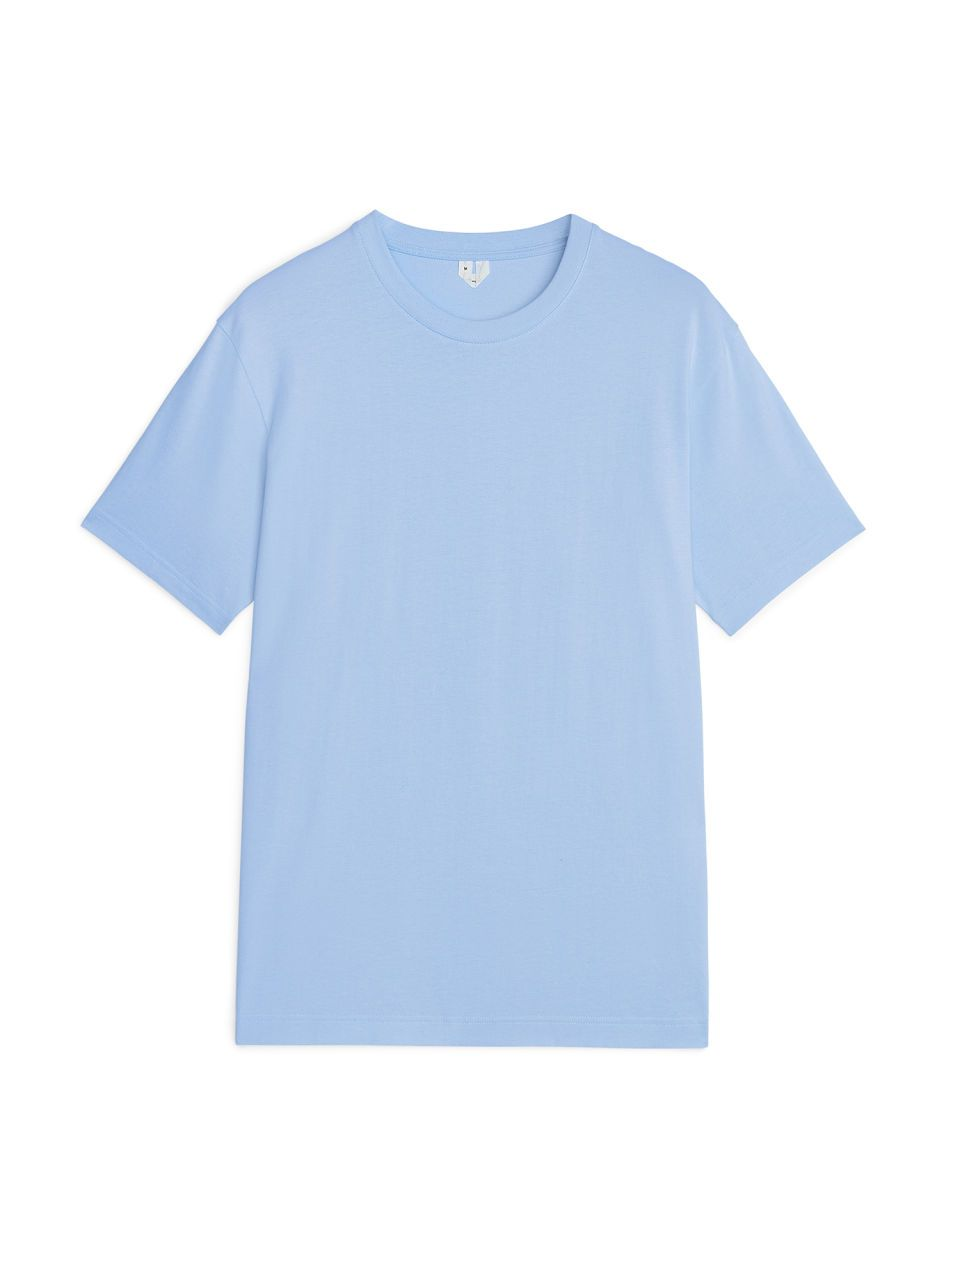 Midweight T Shirt Cool Shirt Designs Shirts Blank T Shirts